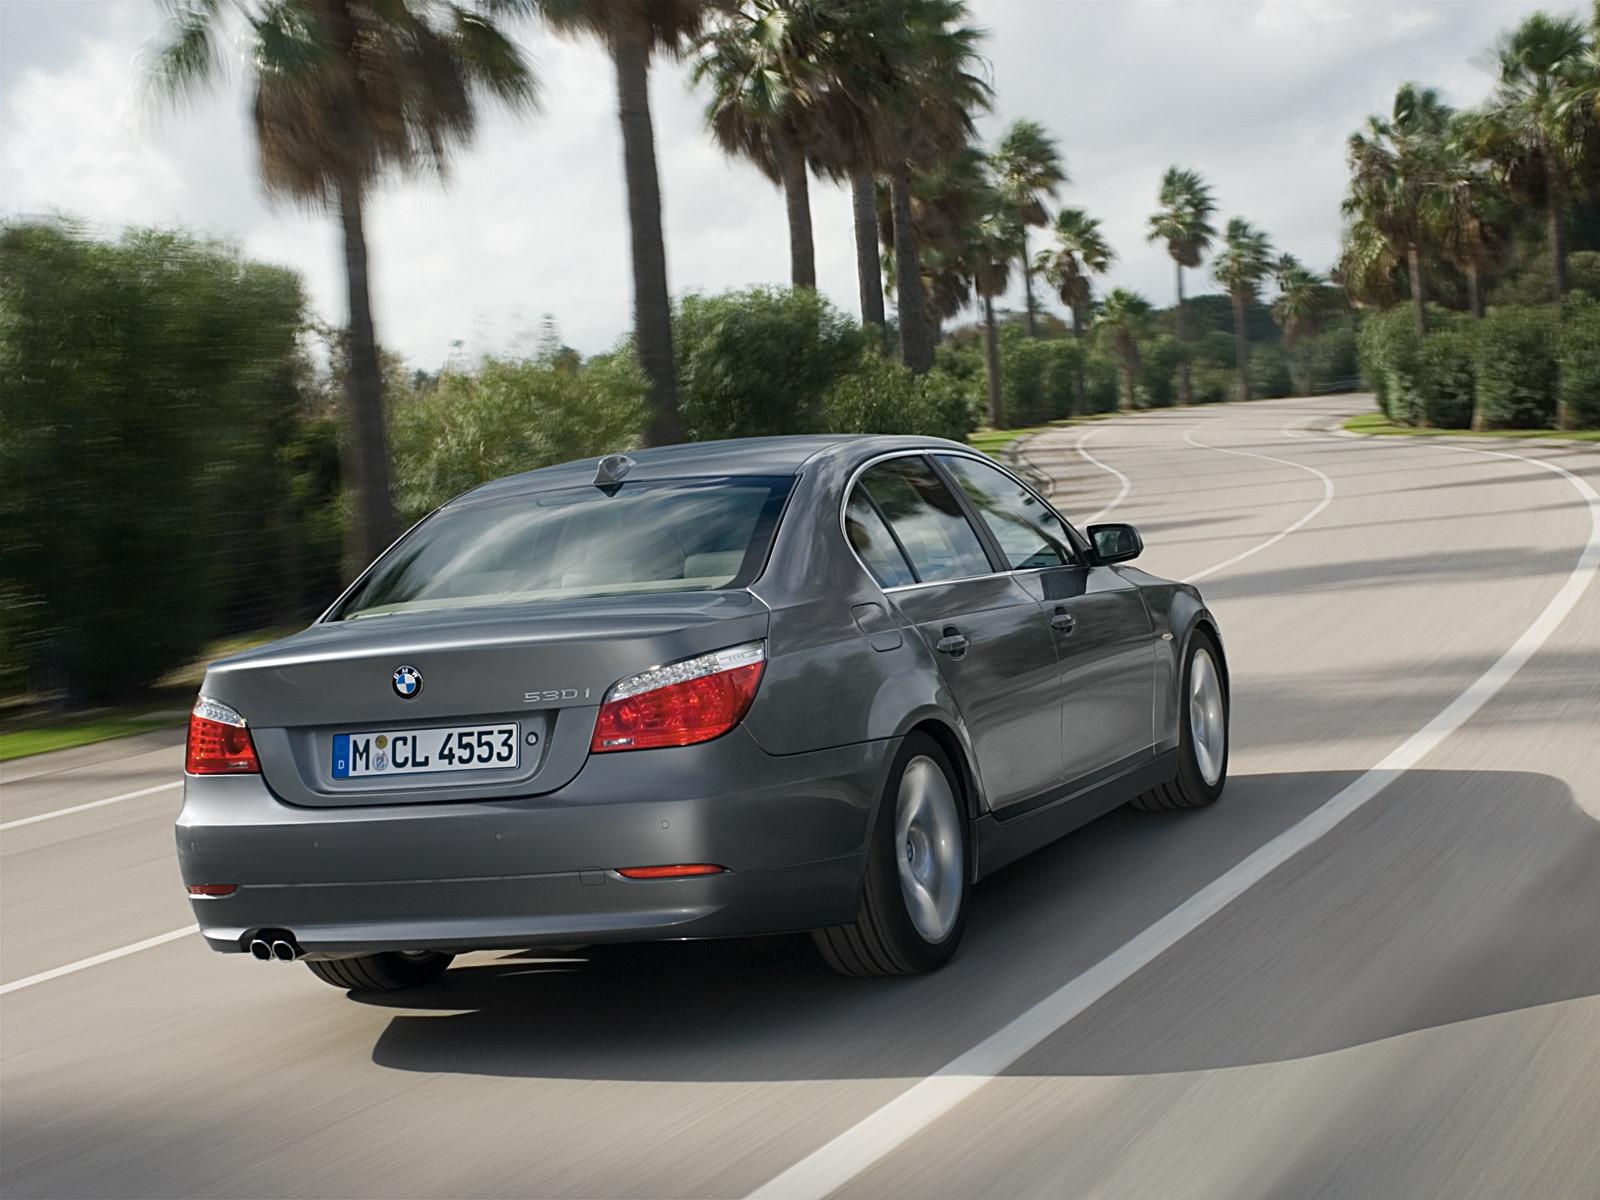 0911 01 Z 2009 BMW 535i Sedan Rear Three Quarter View